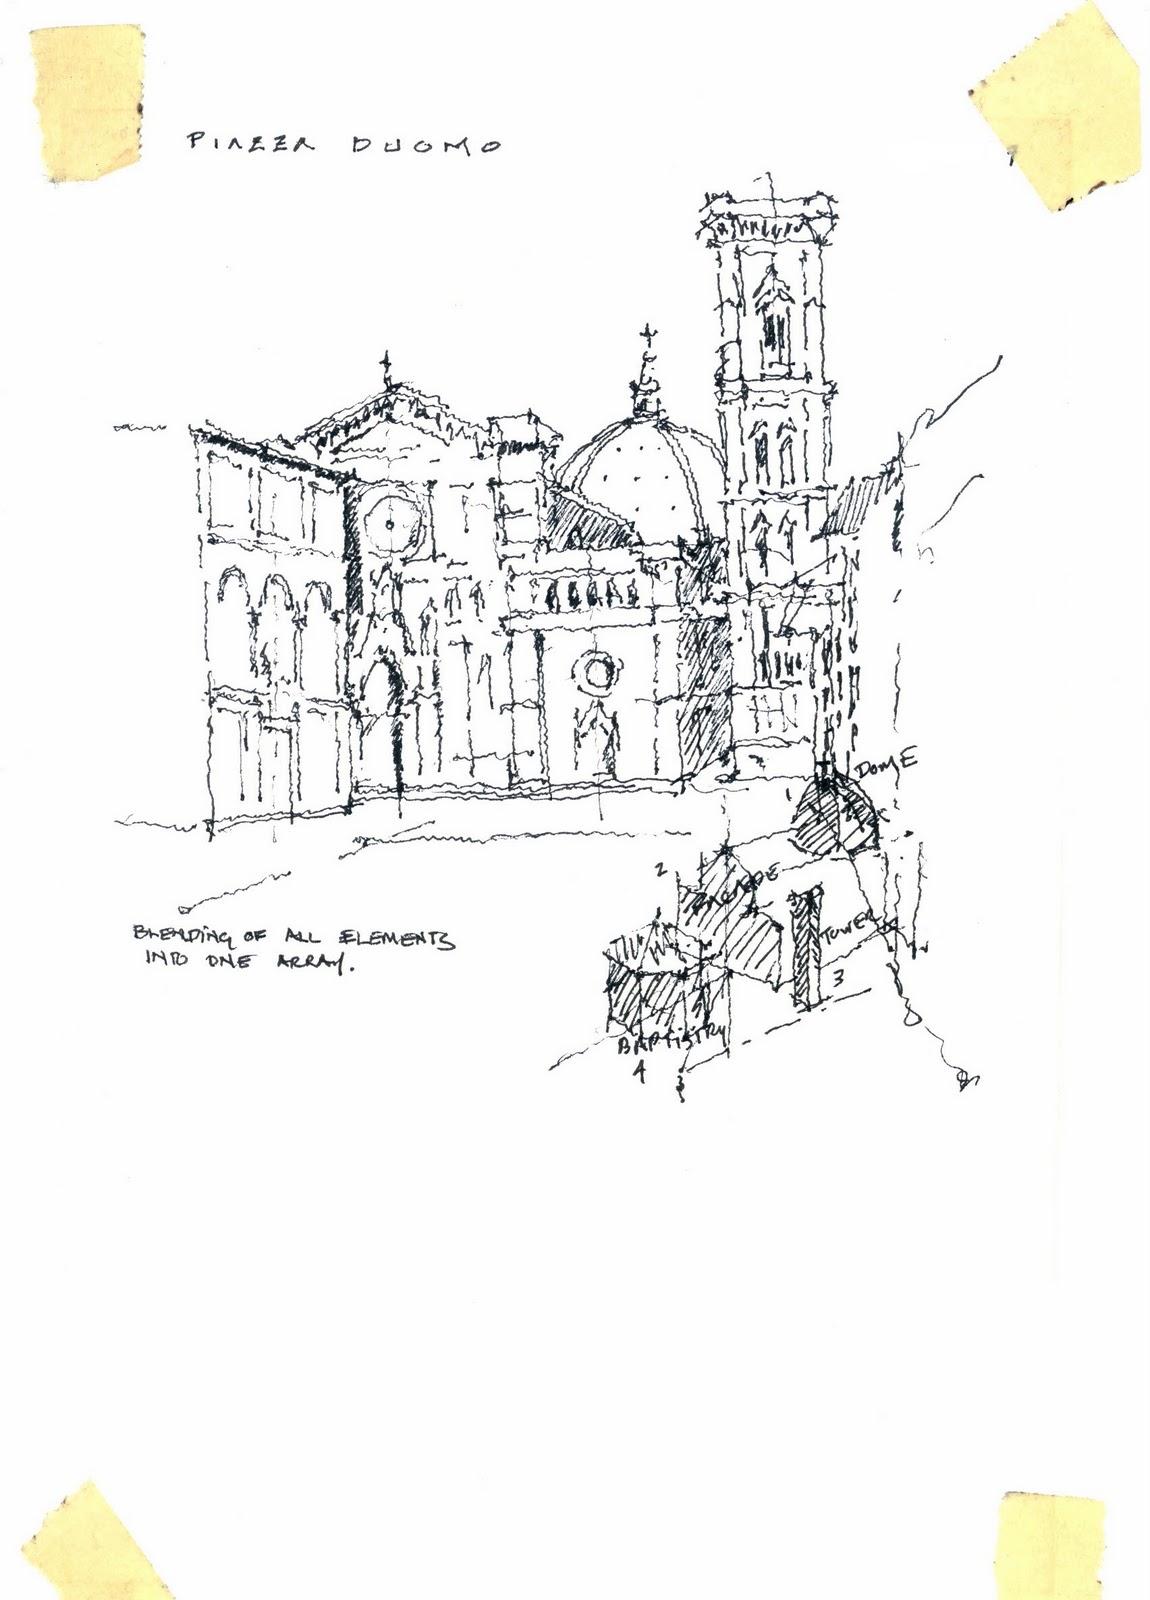 Il Duomo a Firenze (Nima Yadollahpour)